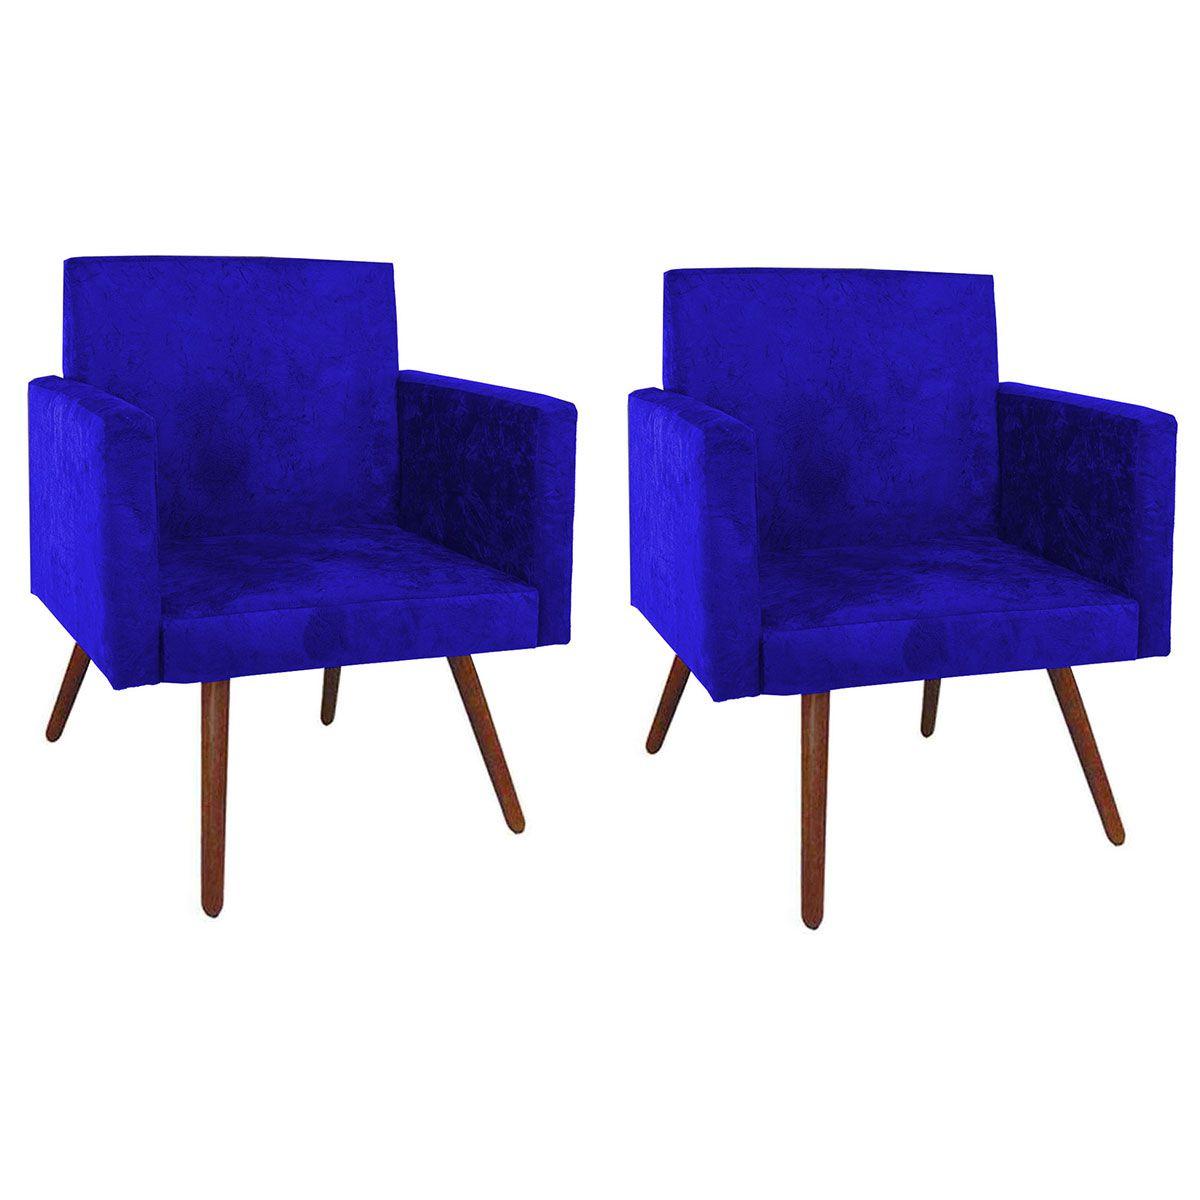 Kit 2 Poltronas Decorativa Nina Luxo Pés Palito Azul Marinho